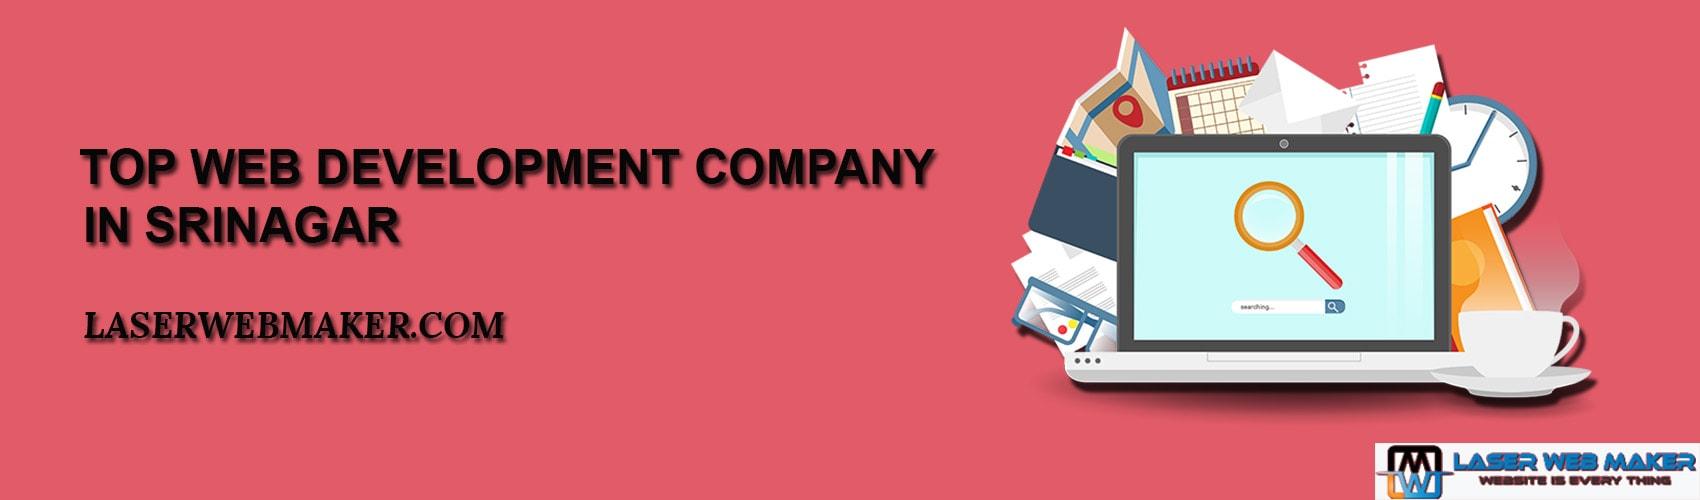 Top Web Development Company In Srinagar